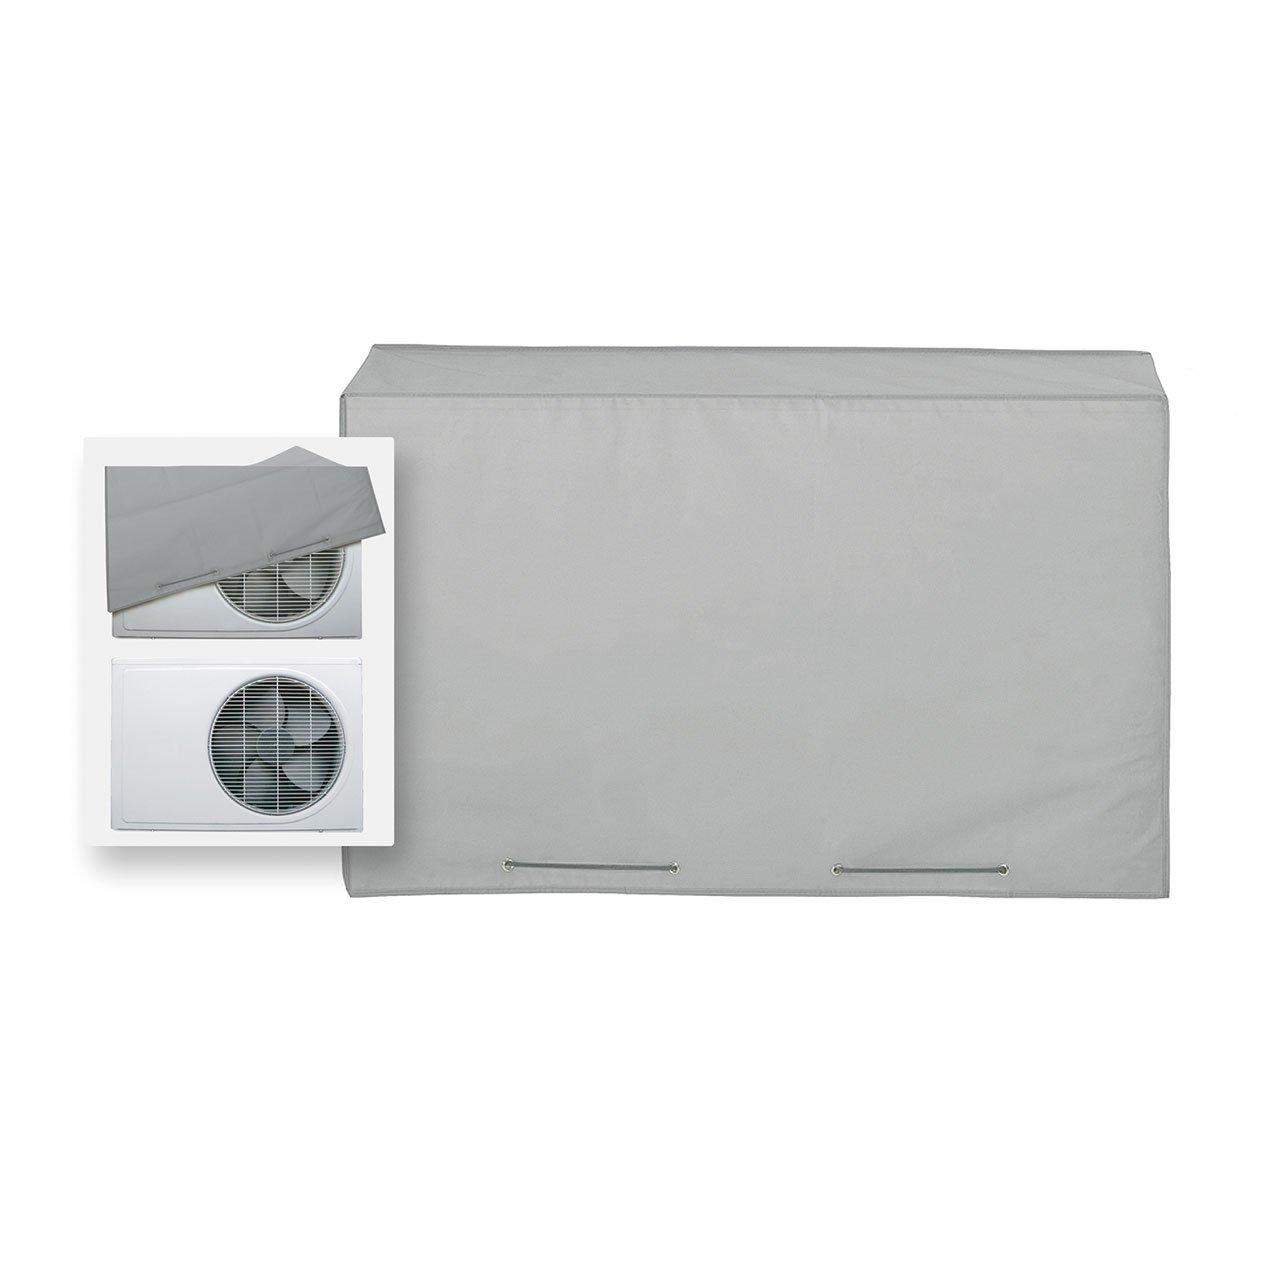 rayen klimaanlage abdeckung 90 x 55 30cm doppelter kordelzug ebay. Black Bedroom Furniture Sets. Home Design Ideas